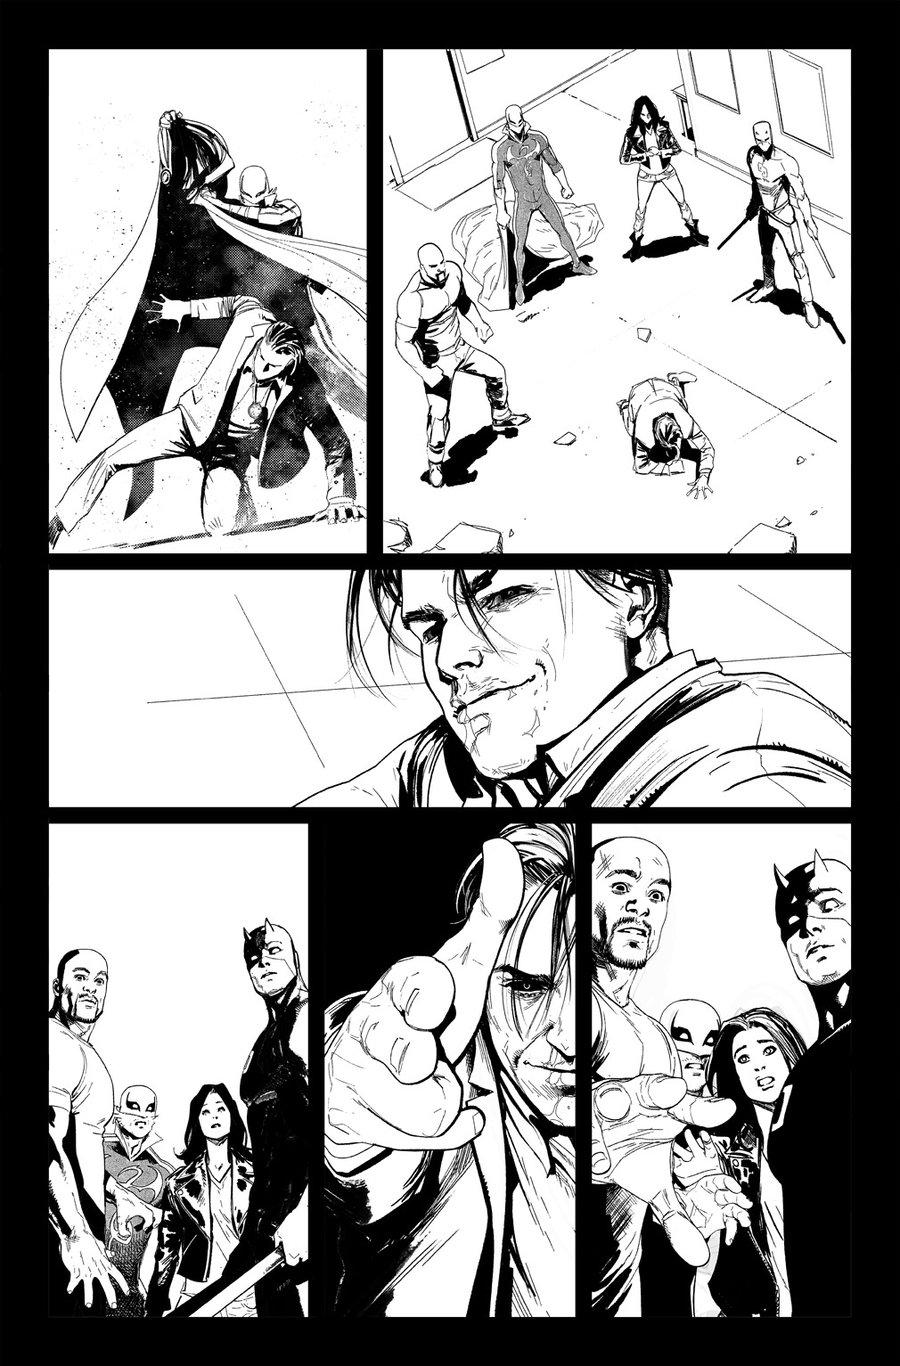 Image of DEFENDERS #10, p.15 ARTIST'S PROOF